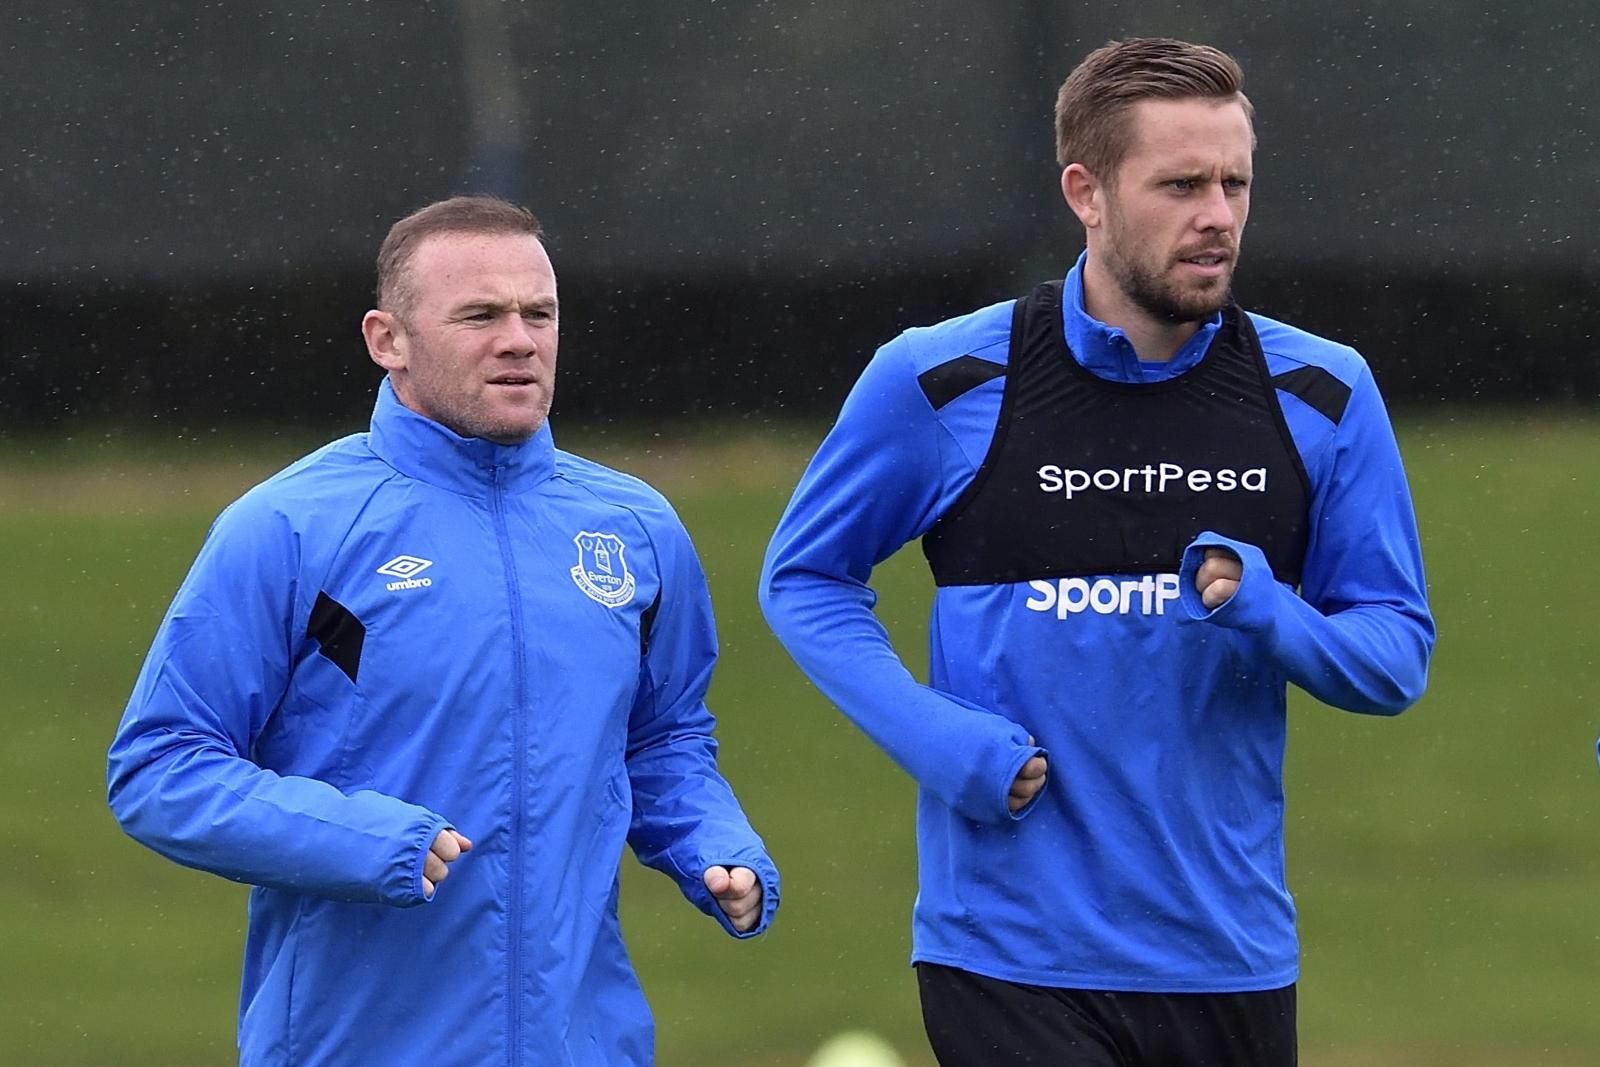 Wayne Rooney and Gylfi Sigurdsson